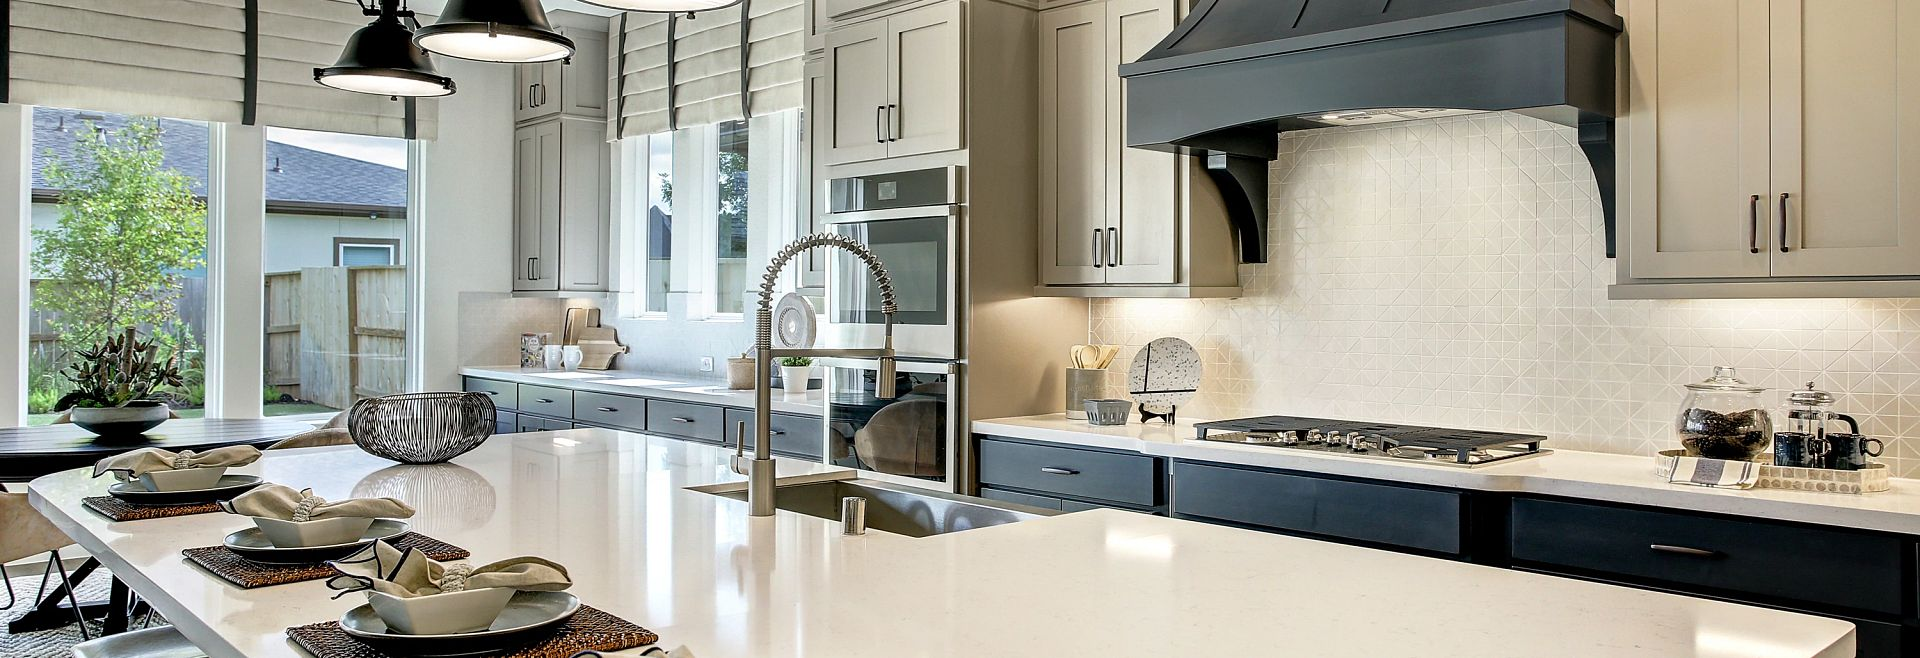 Del Bello Lakes Plan 6020 Kitchen